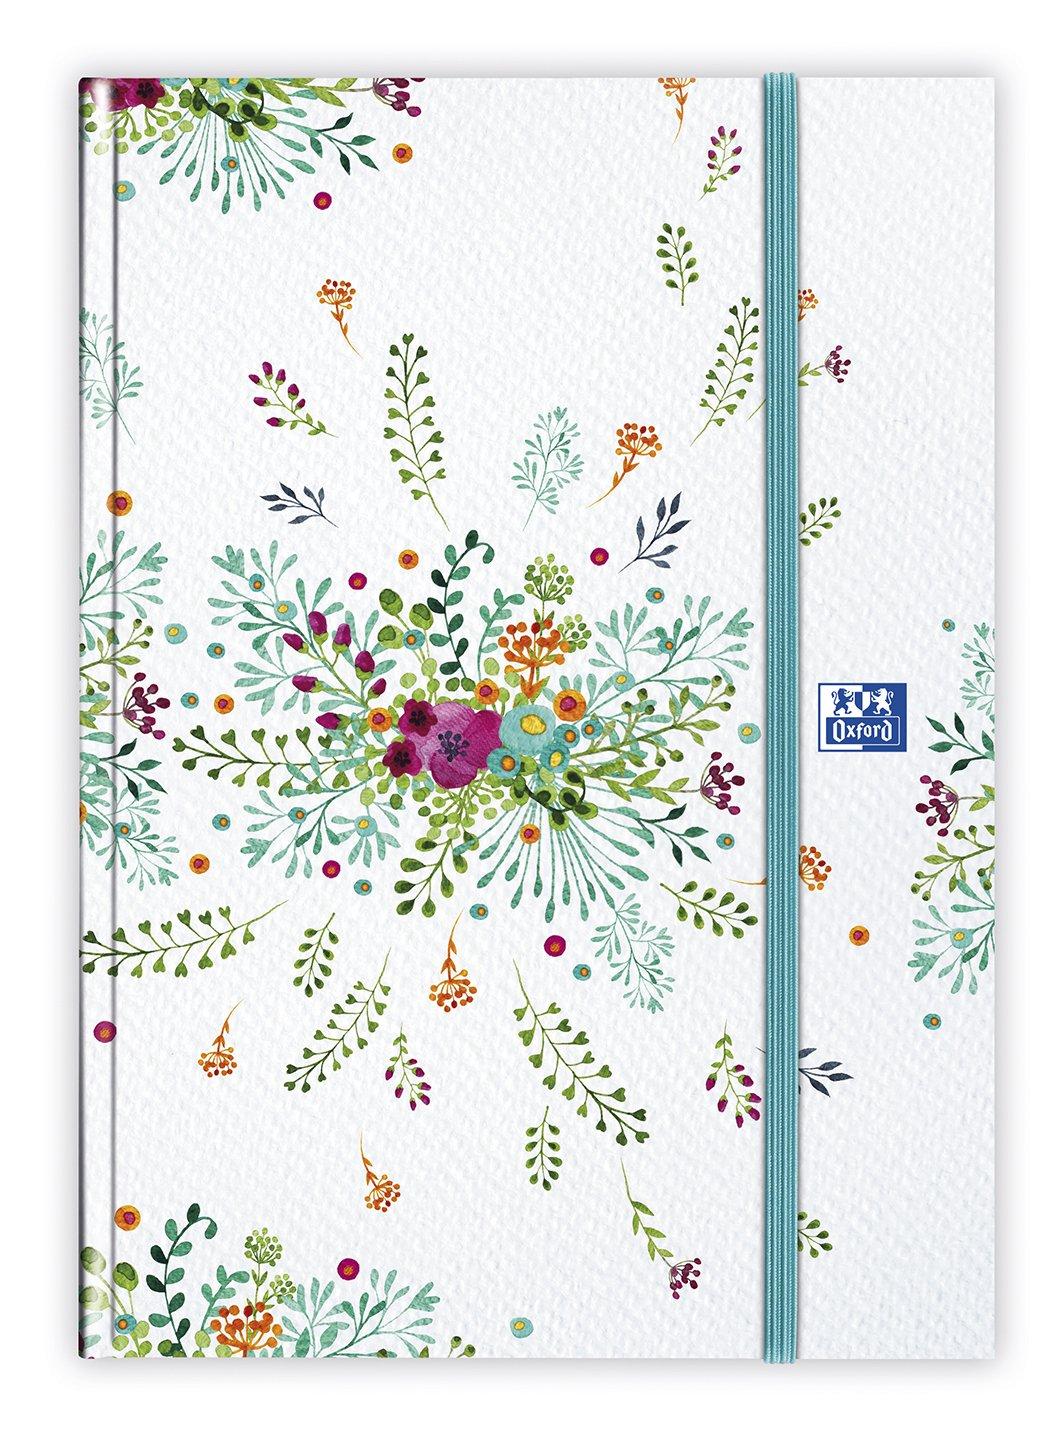 Oxford 100735837 Flowers Agenda Civil Journalier Année 2019 15 x 21 cm Fuchsia Hamelin